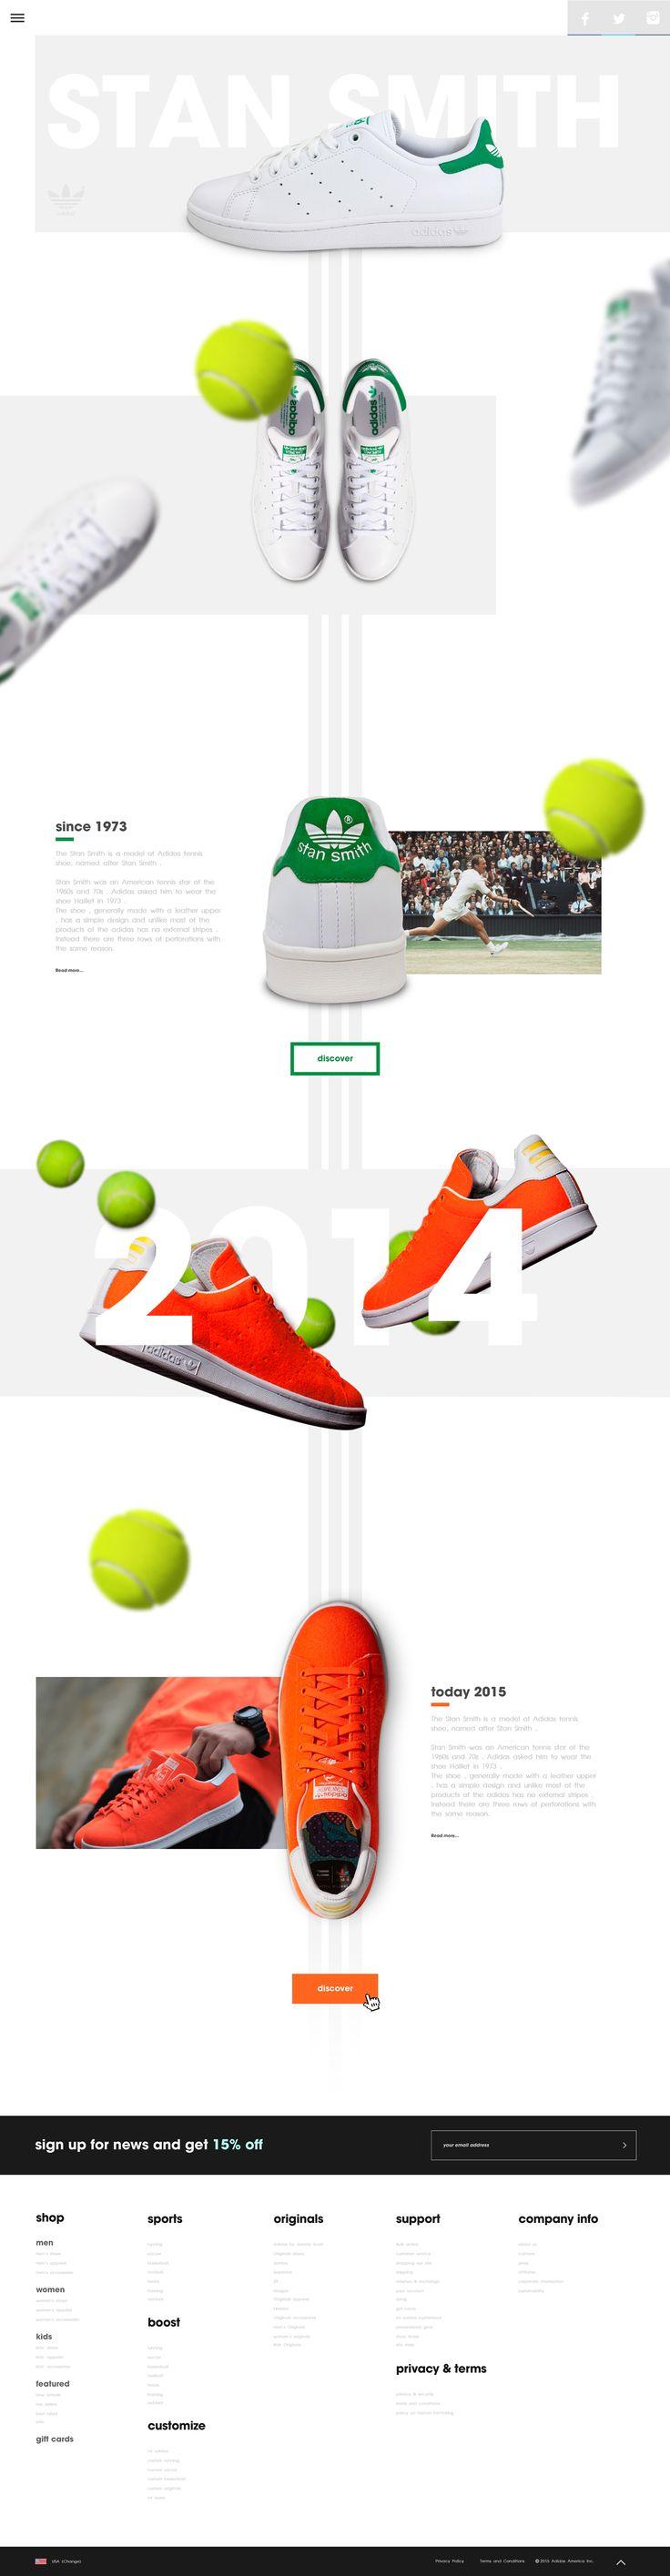 Adidas Design Adidas Web Design | | 3aeeeb3 - allpoints.host